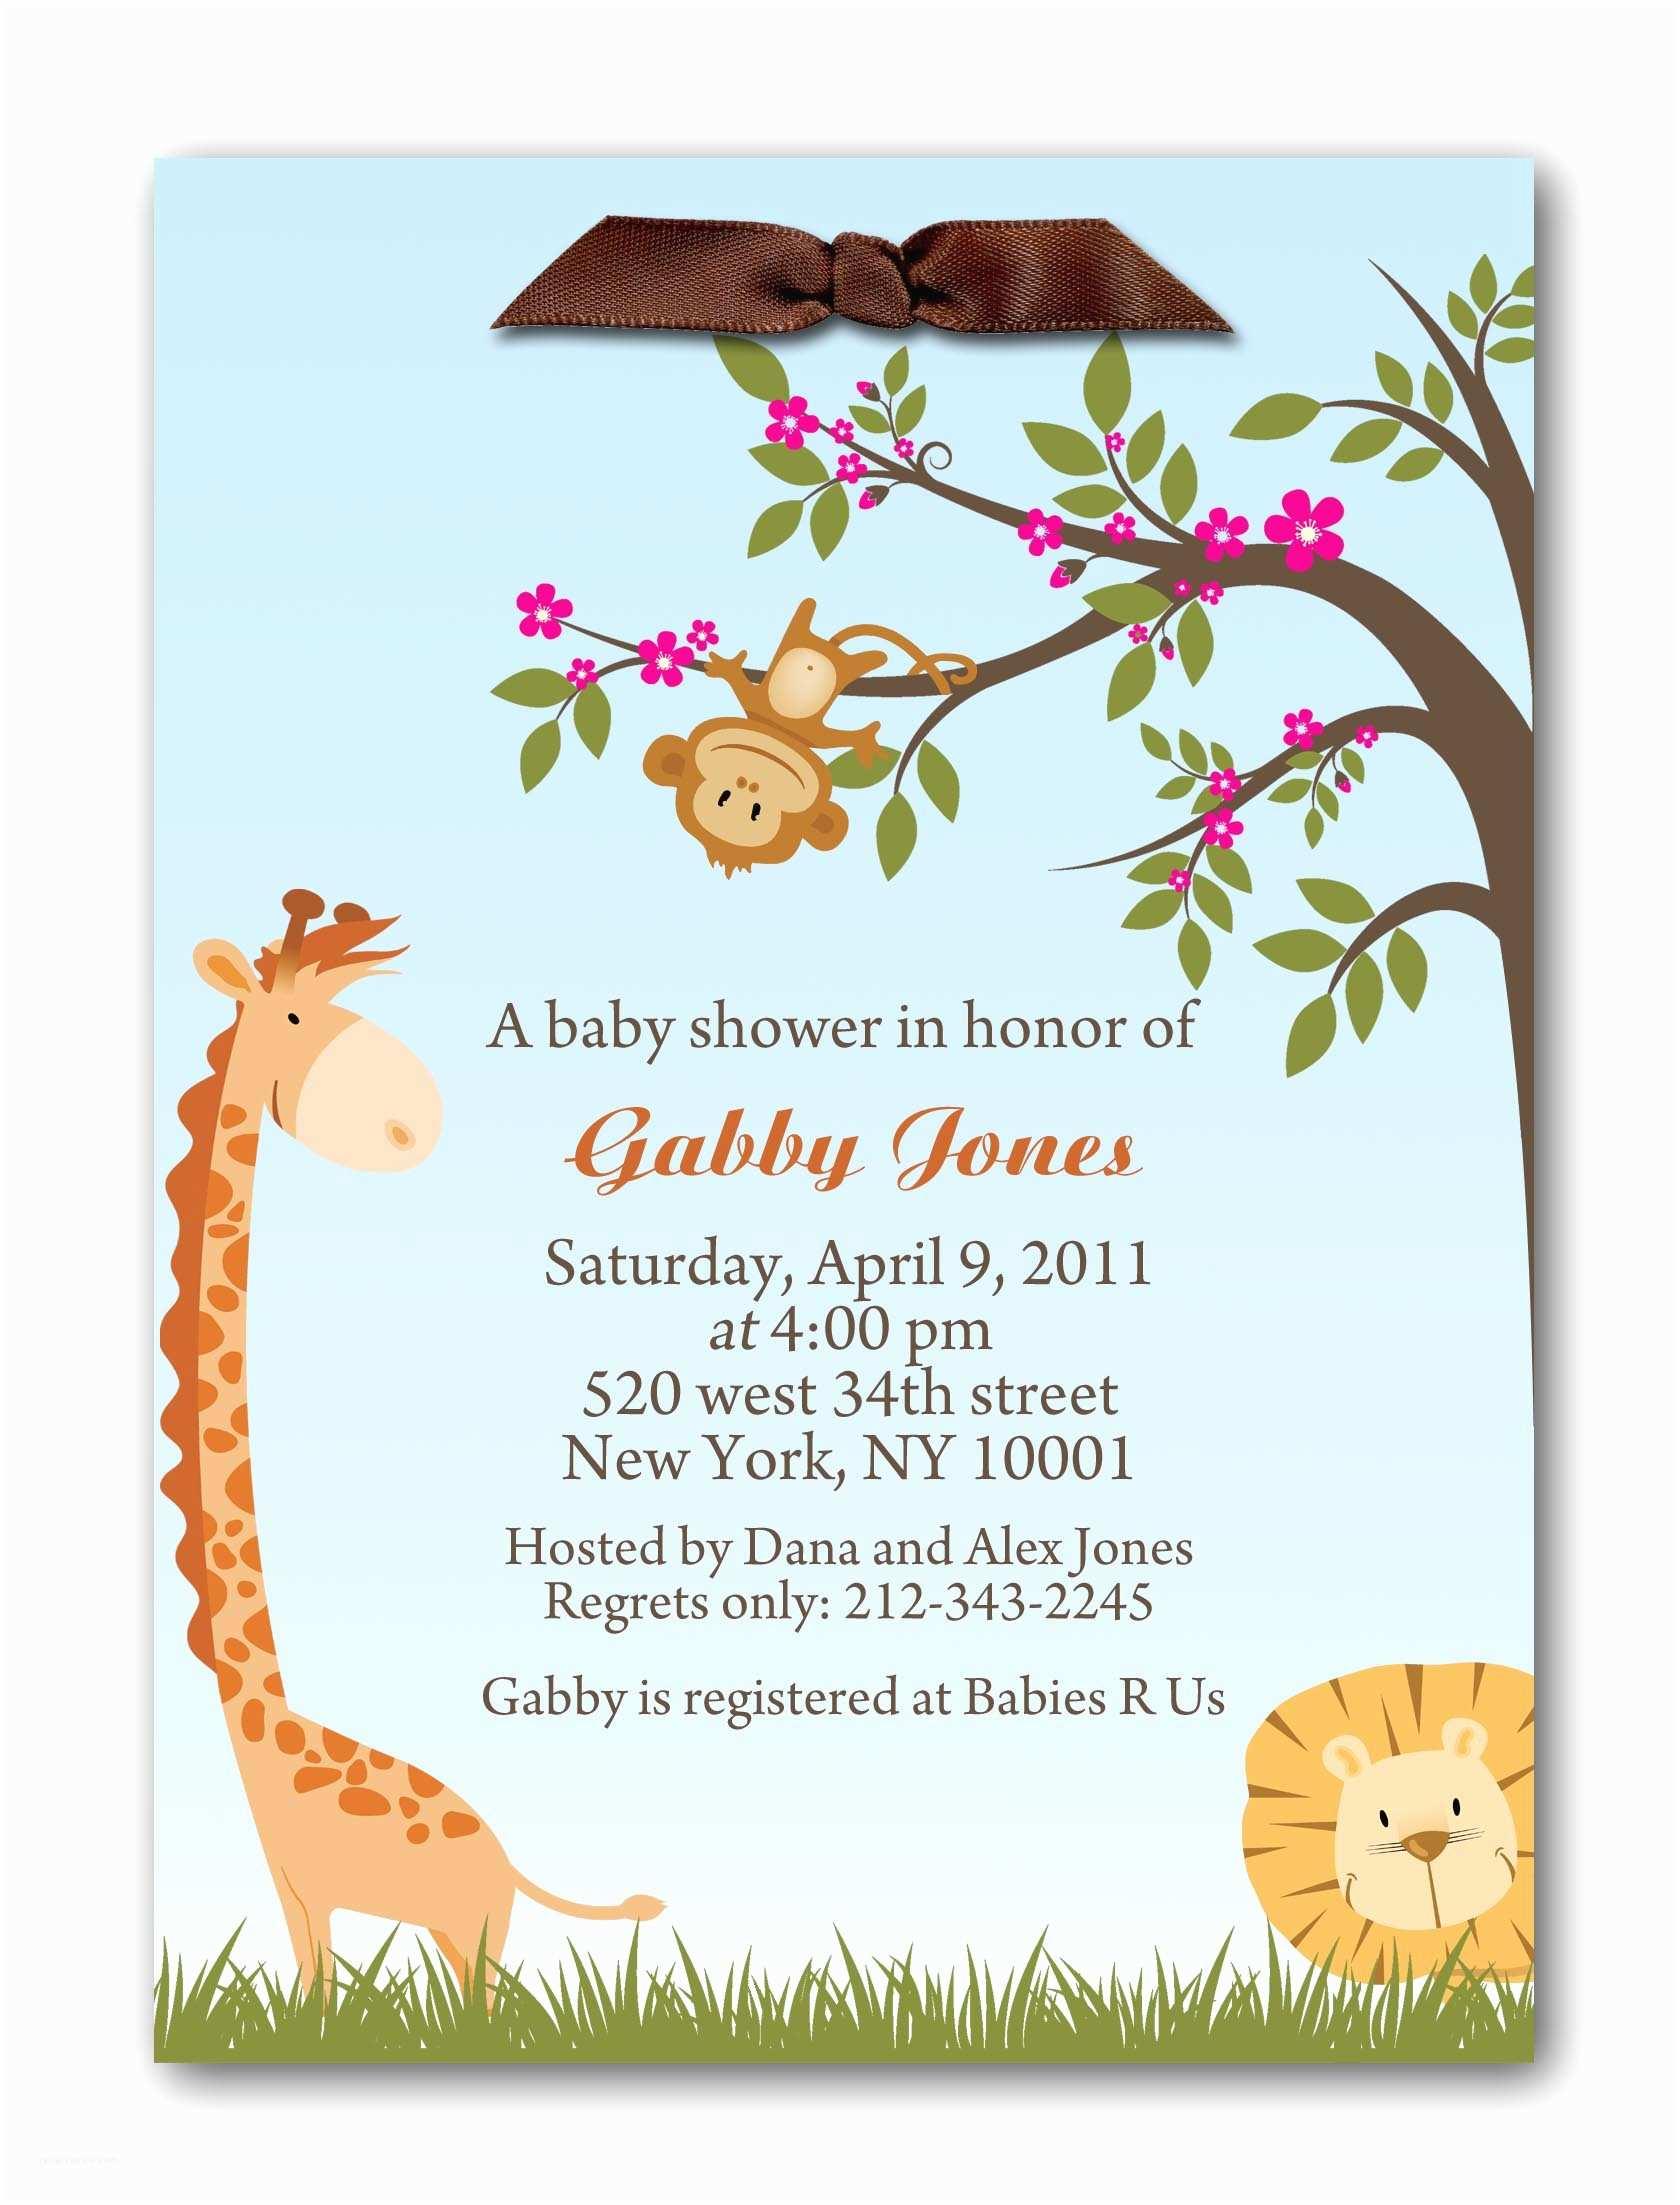 Jungle themed Baby Shower Invitations Jungle Baby Shower Invitations Image